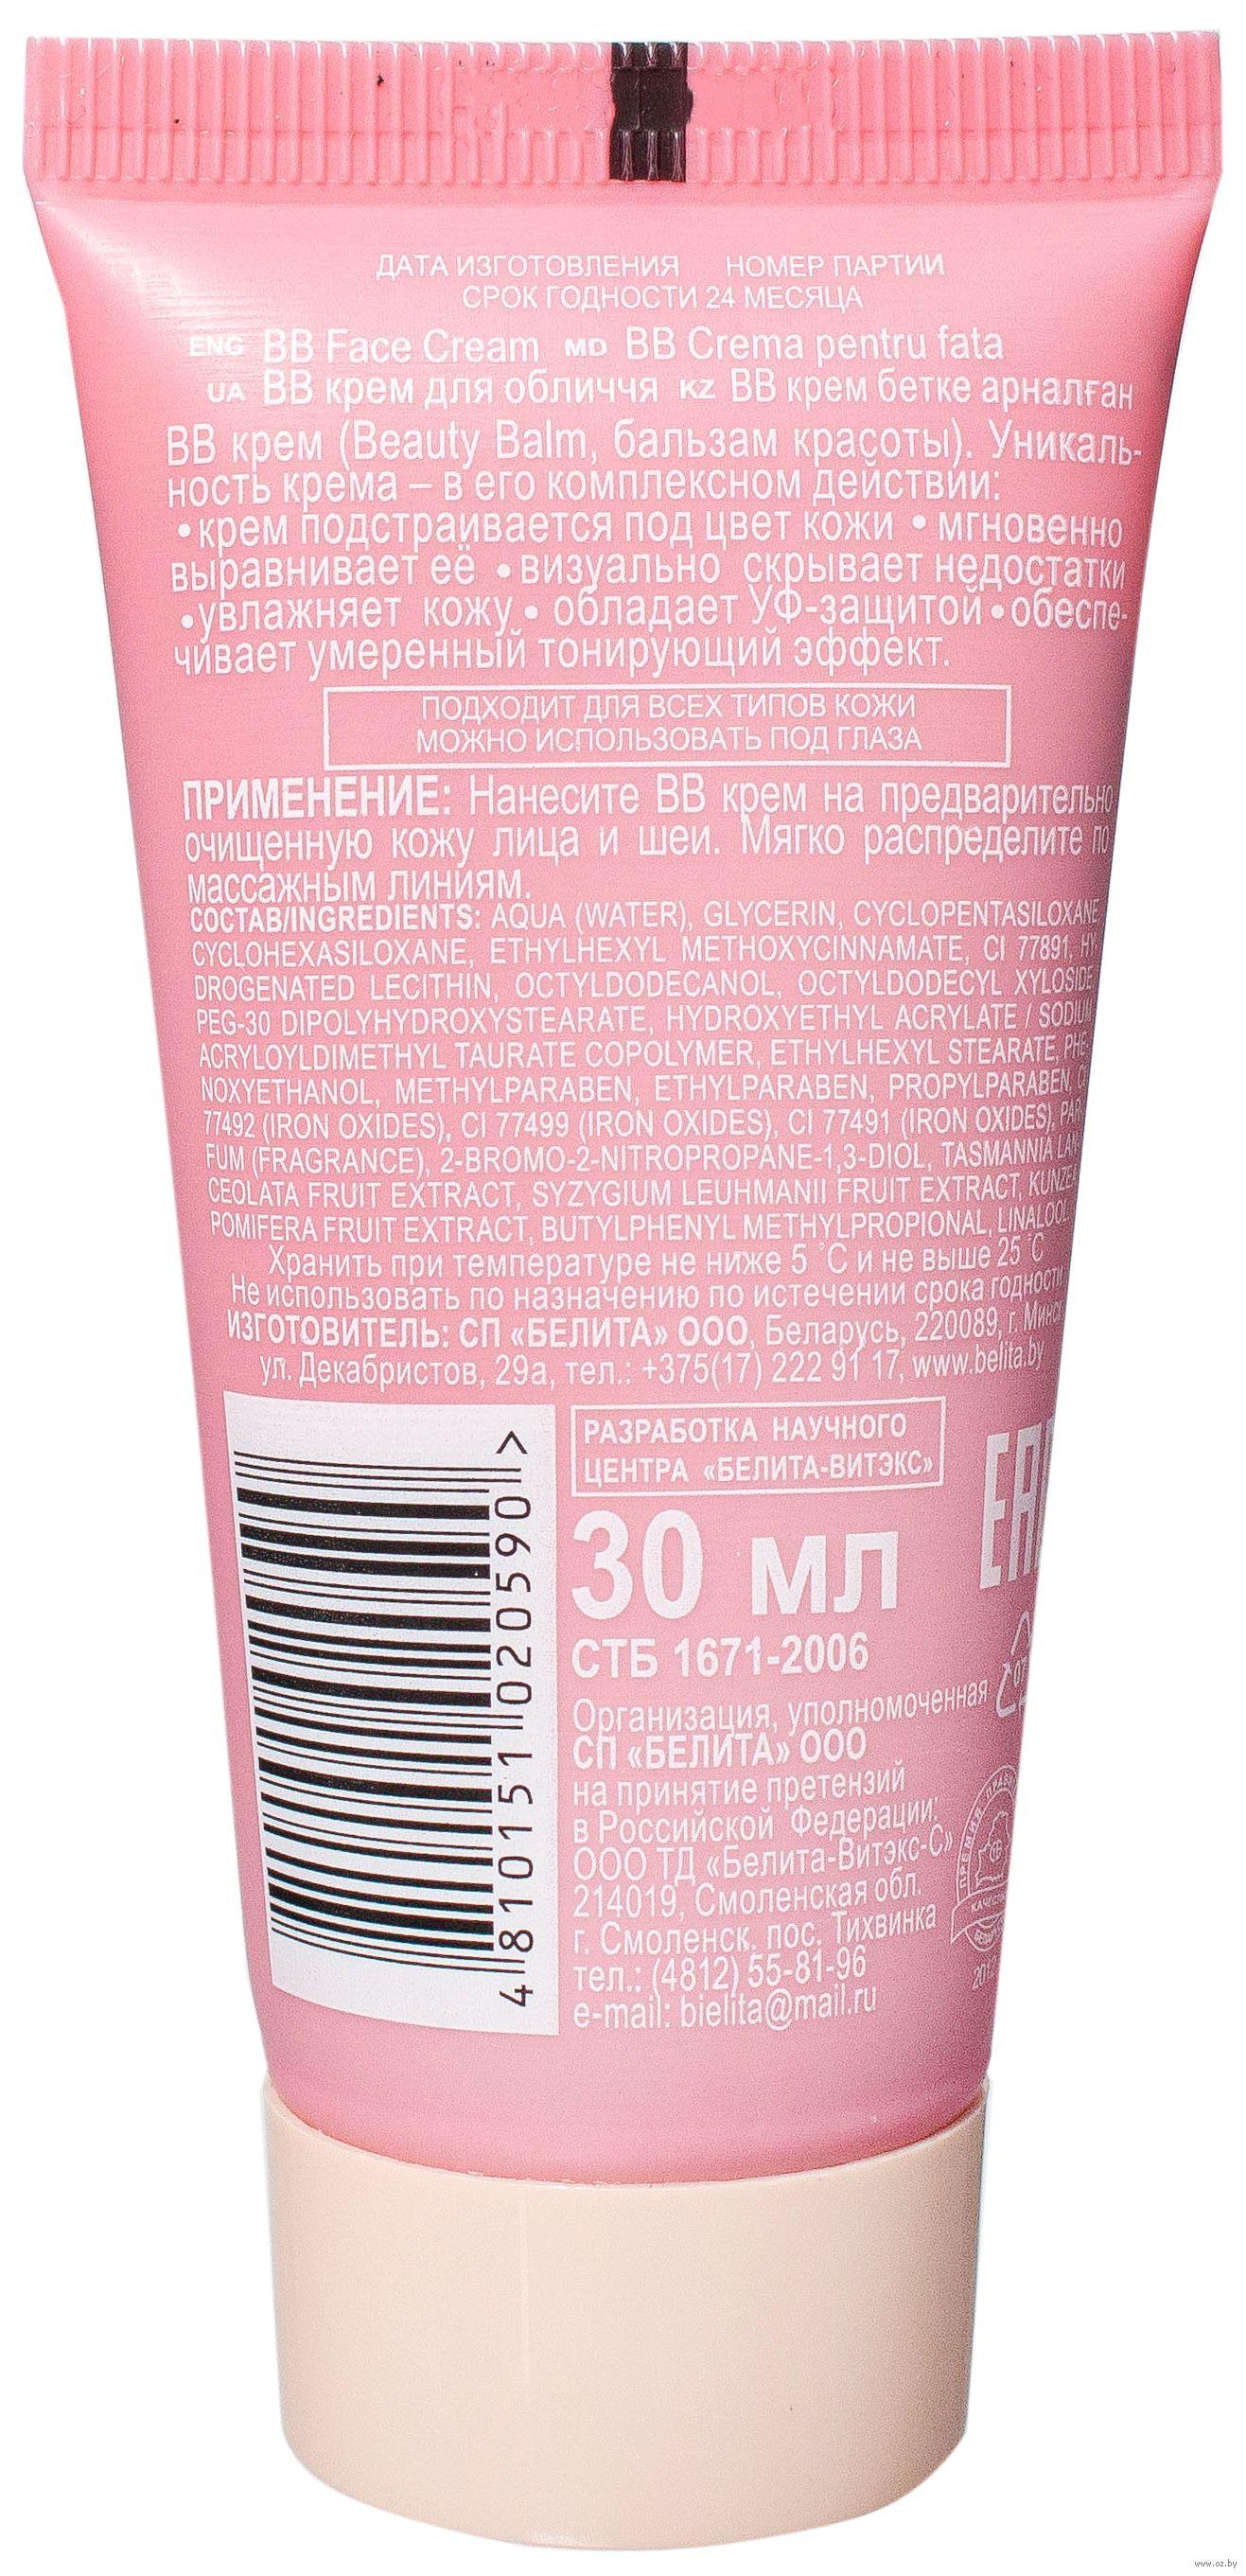 Belita-Vitex: reviews about cosmetics 54